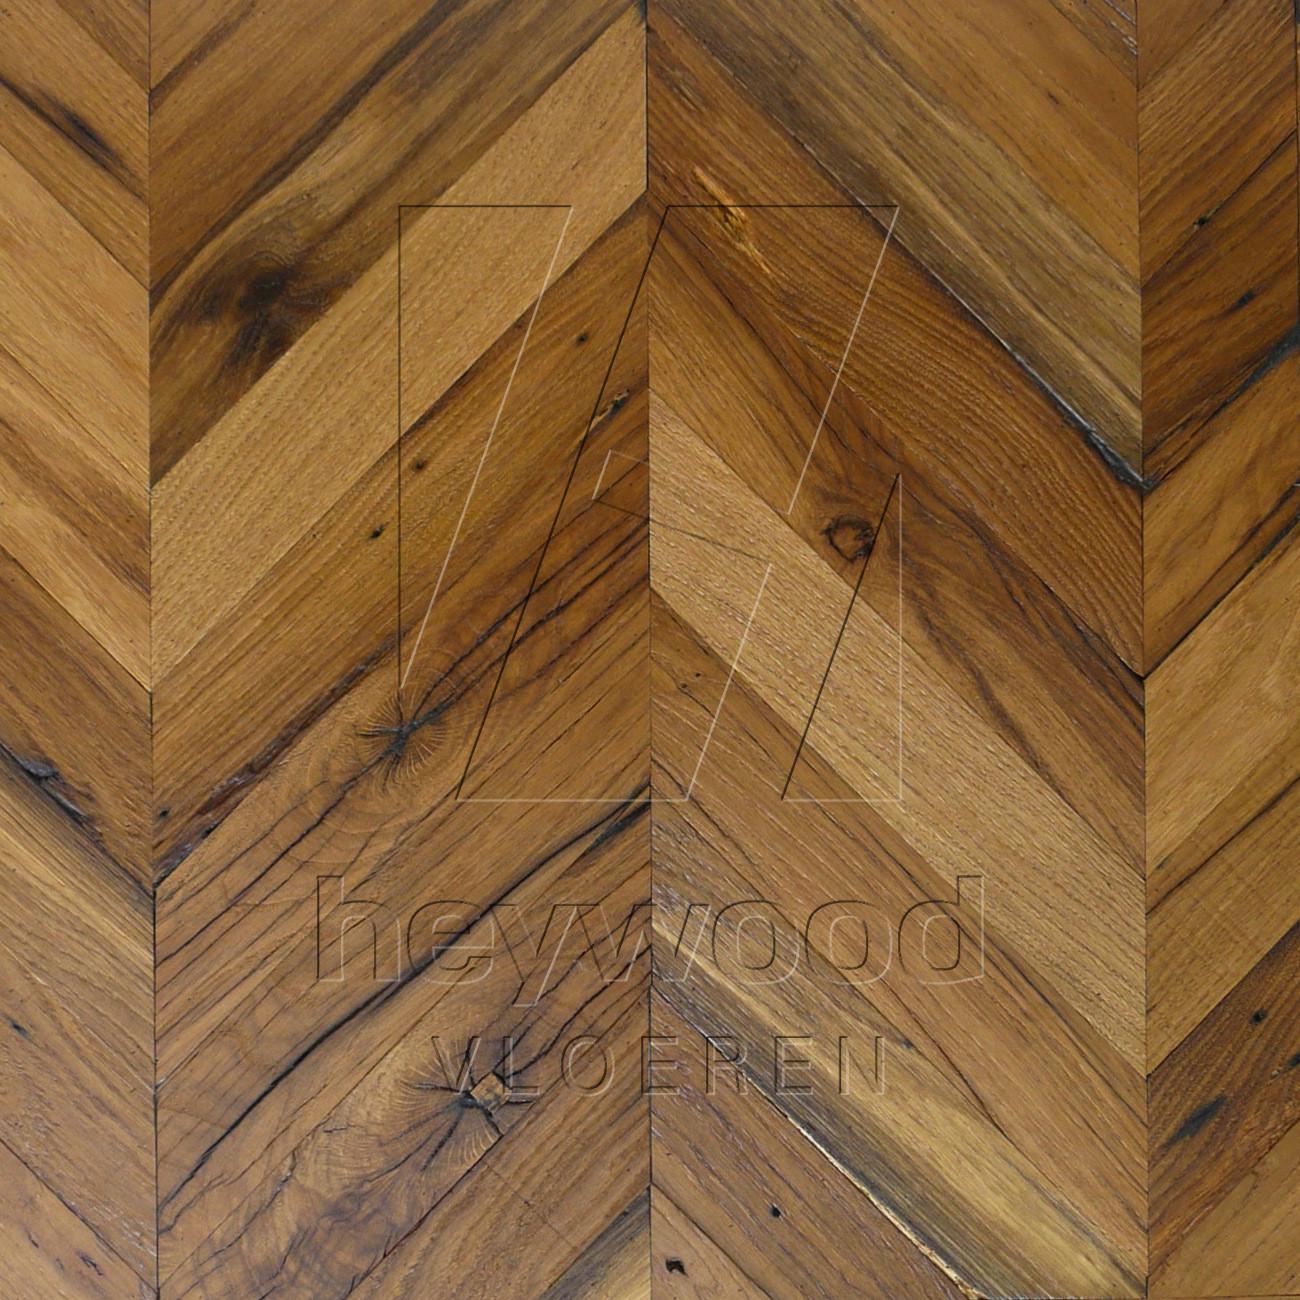 Provence Osmo OIled Reclaimed Oak in Chevron of Pattern & Panel Floors